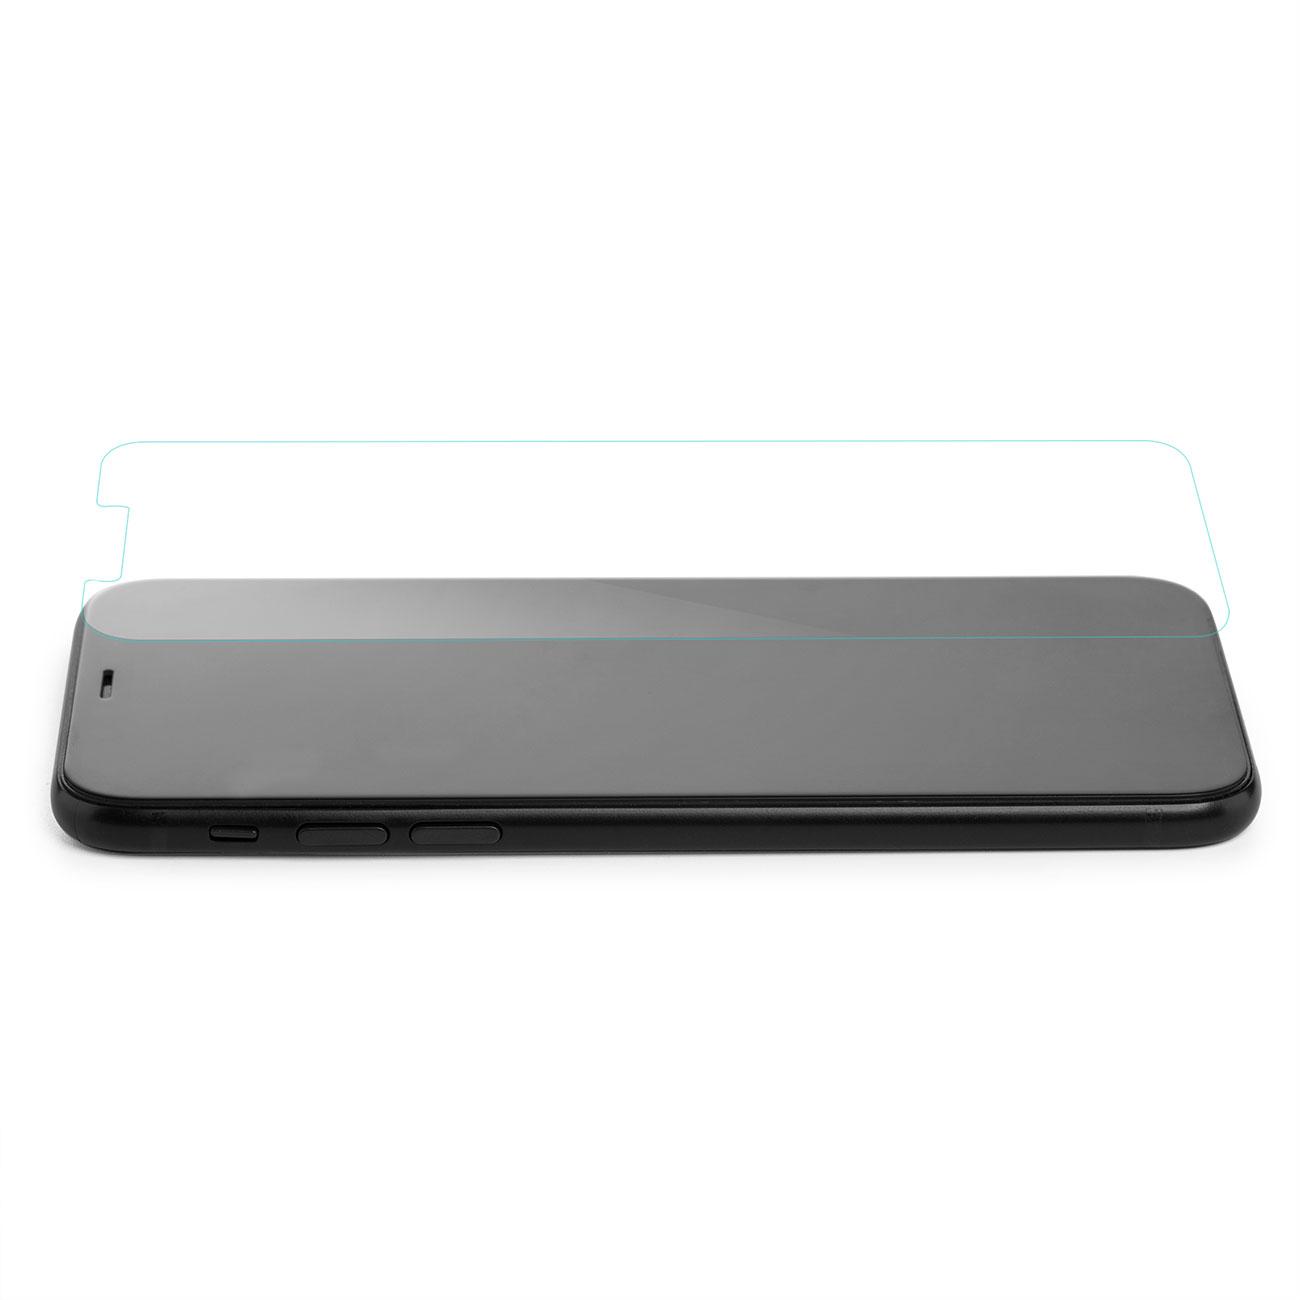 MutuTec iPhone X Custodia Protezione Cover Custodia Rigida - Nero